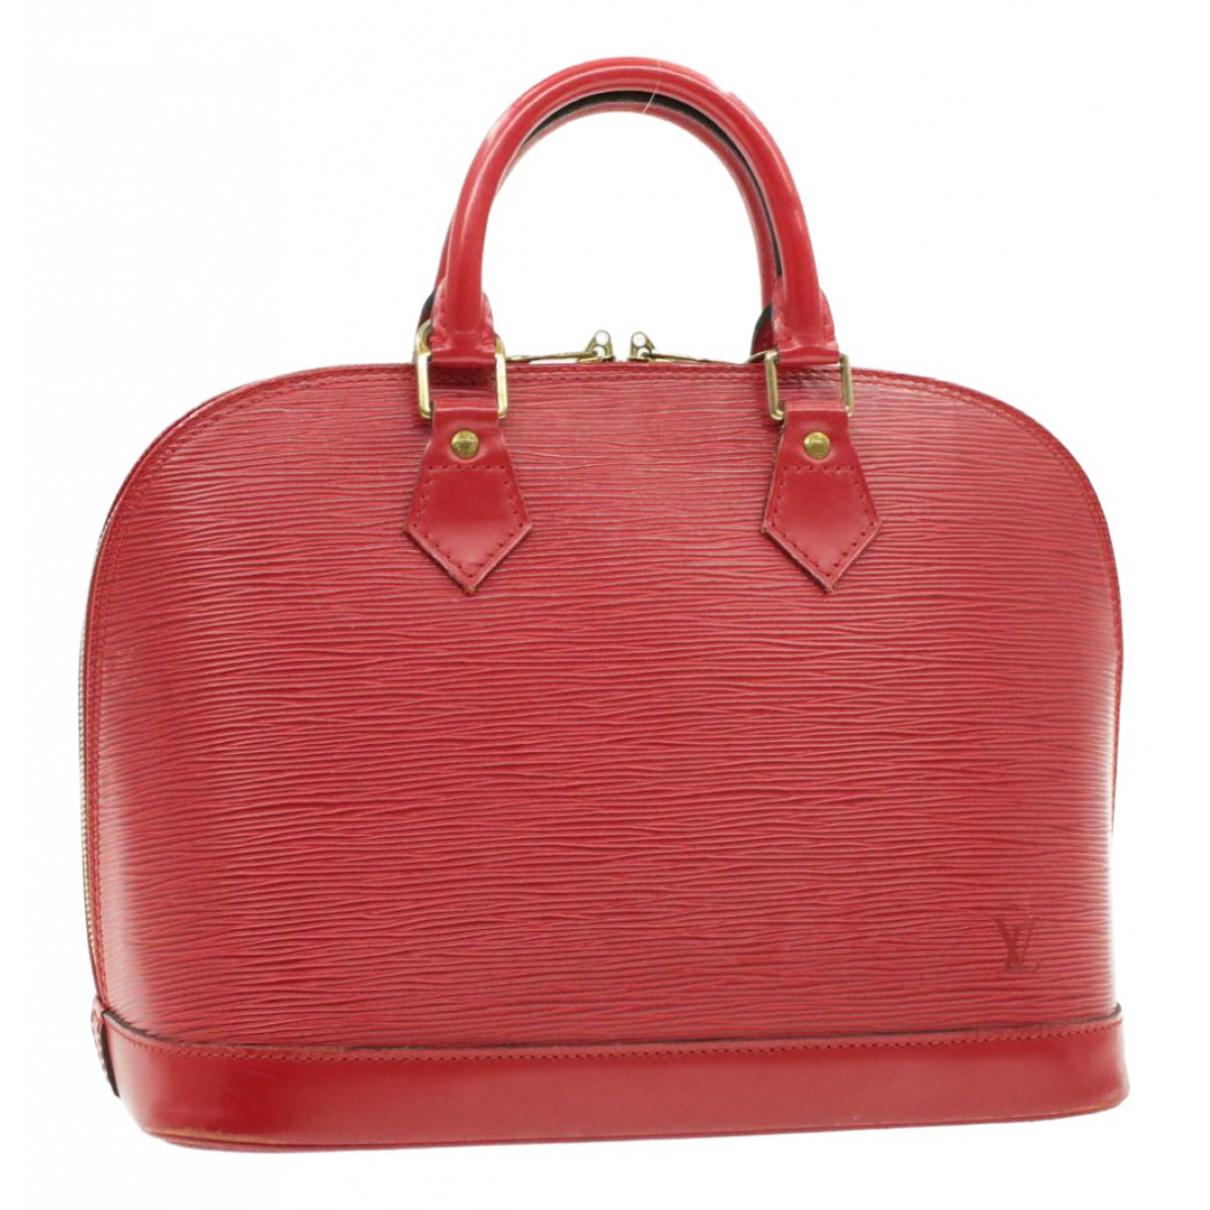 Louis Vuitton Alma Red Leather handbag for Women N